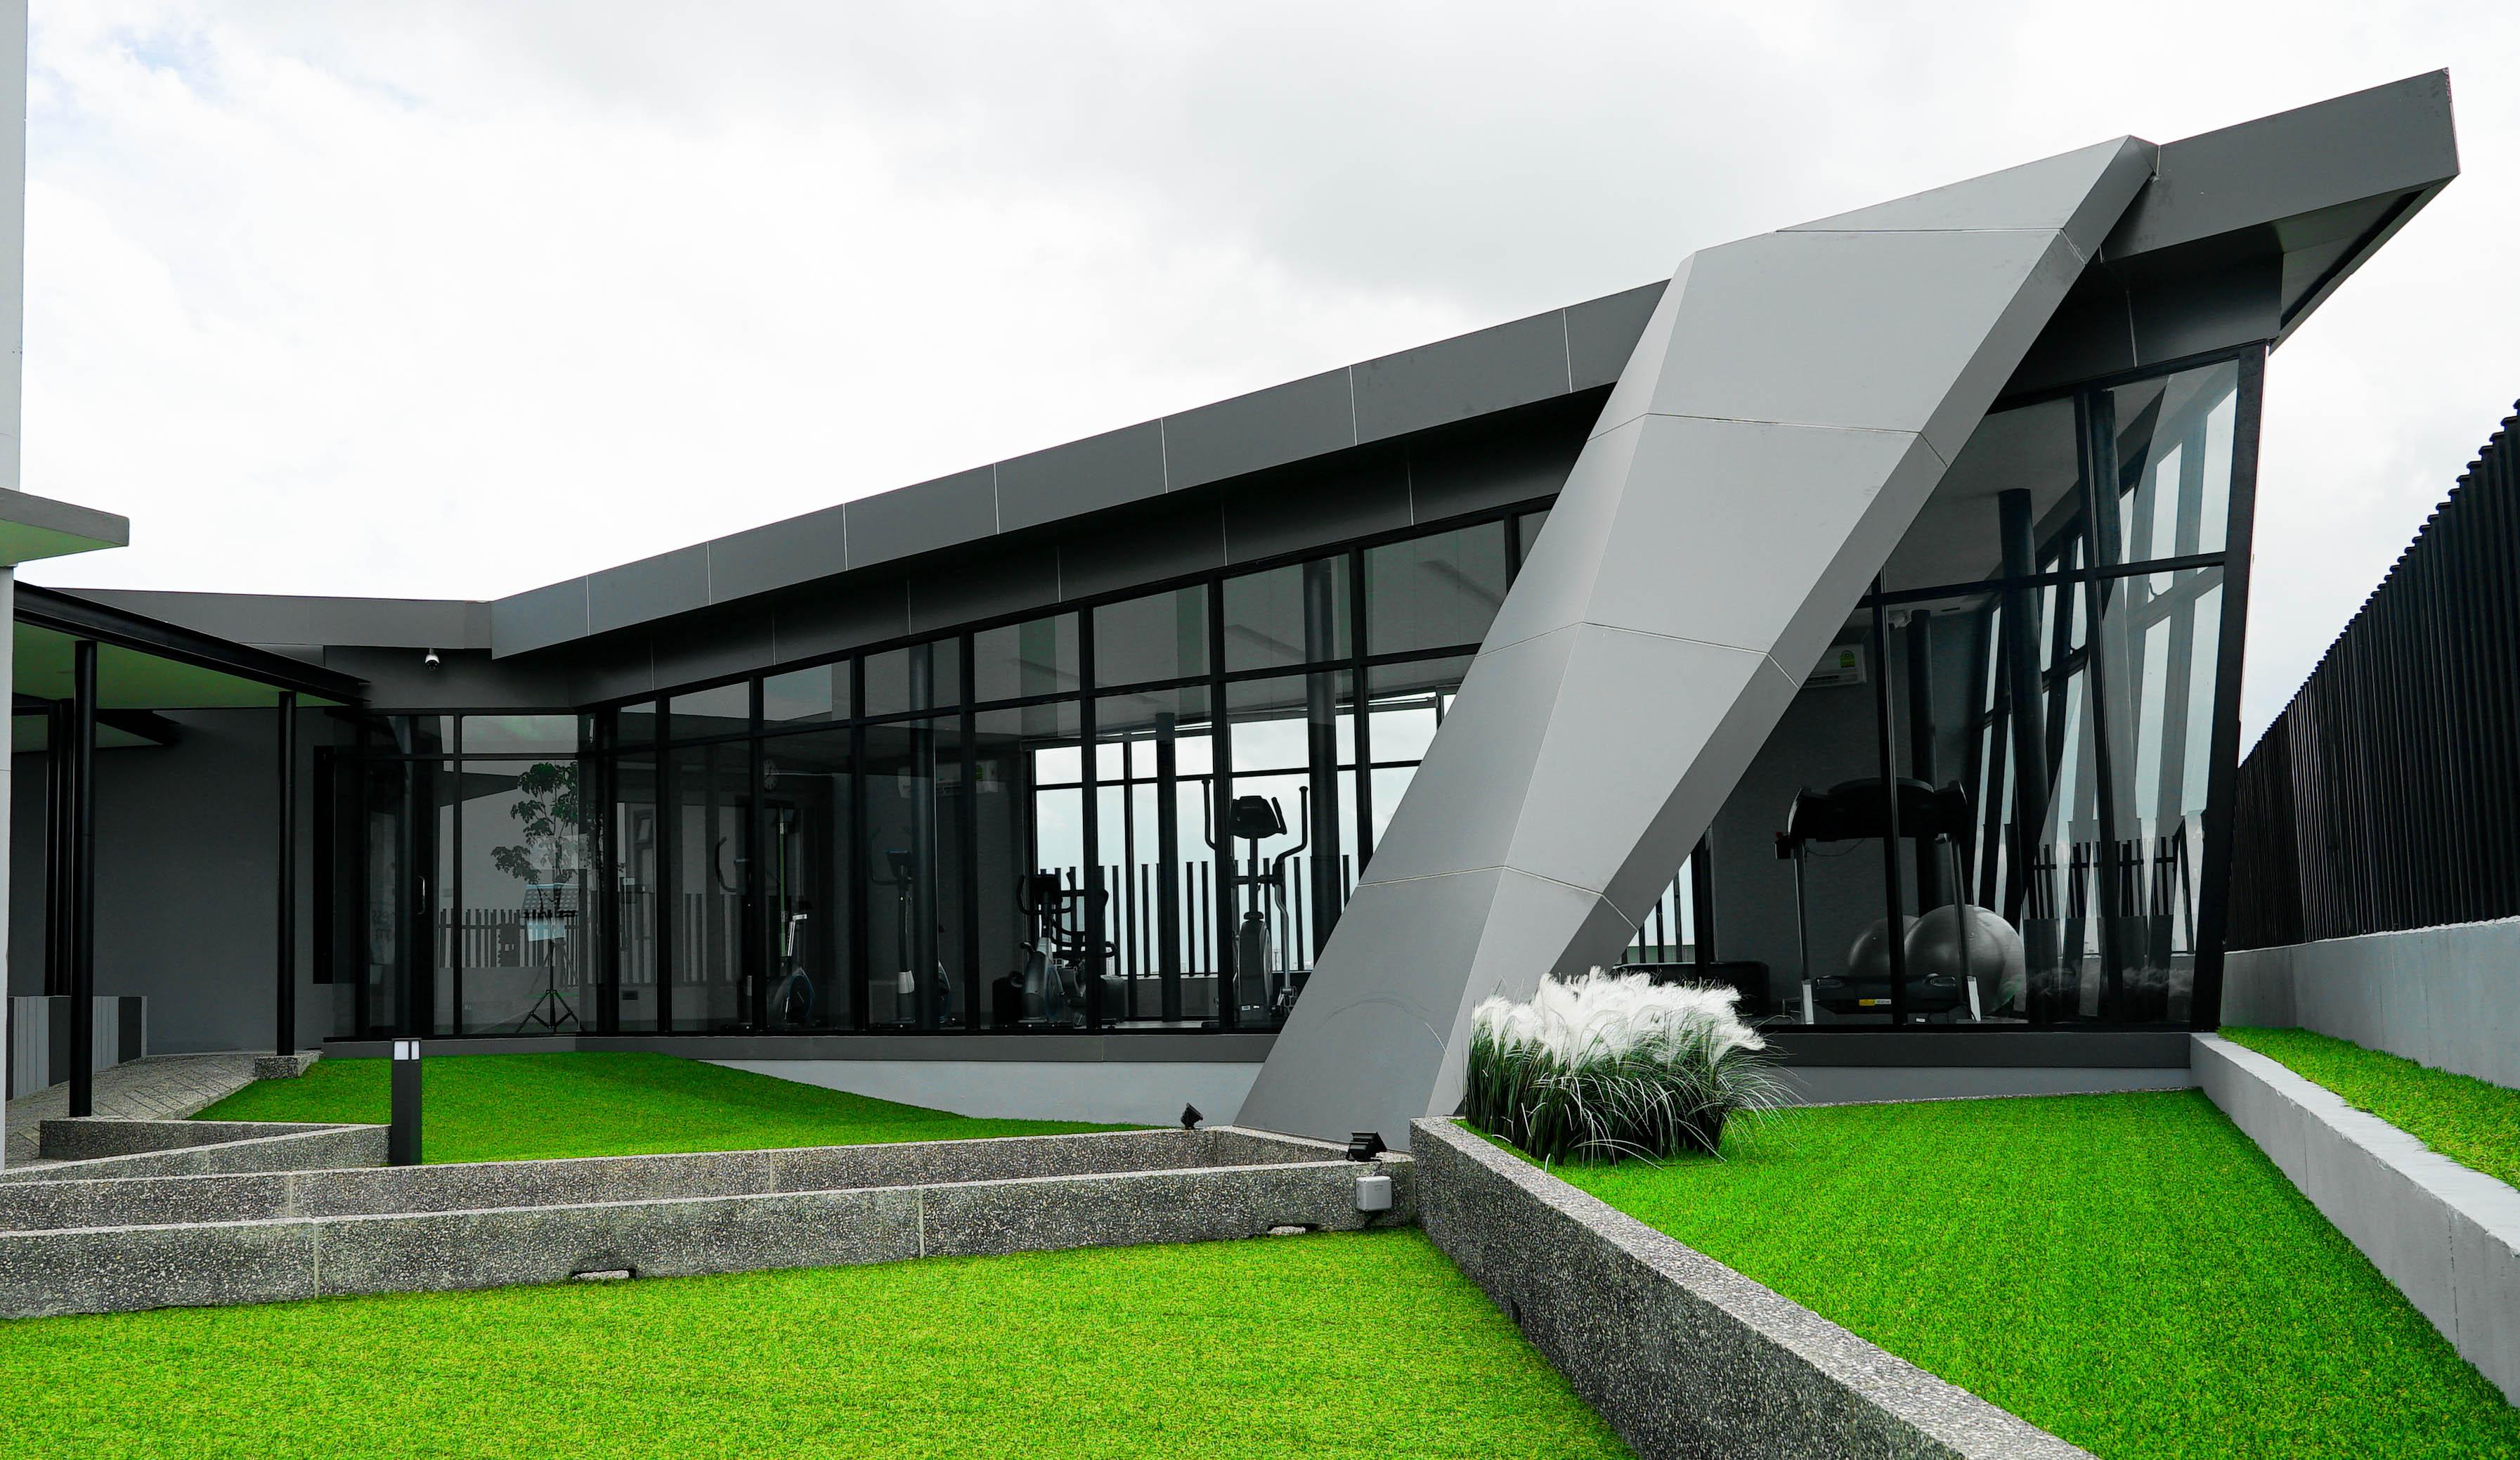 TBT-DAF landscape architecture design de botan 32